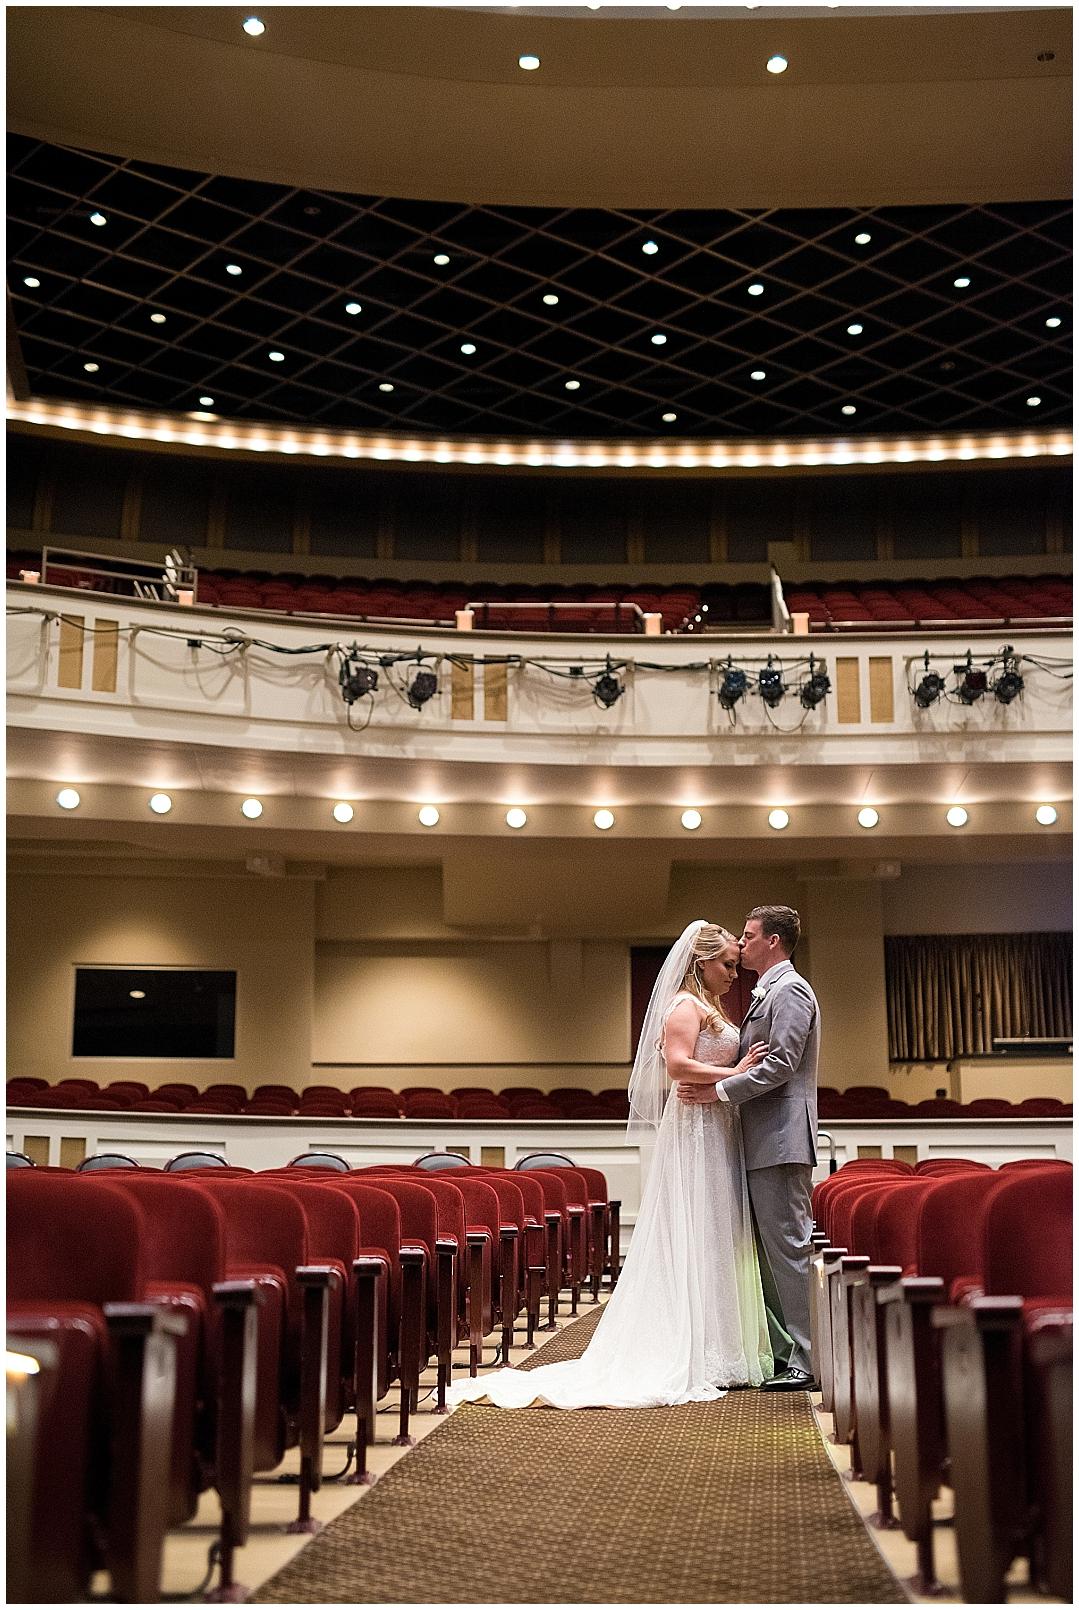 Mahaffey Theatre Wedding, Downtown St. Petersburg Wedding, Morean Center for Clay Wedding, Castorina Photography, St. Petersburg Wedding Photographer_0025